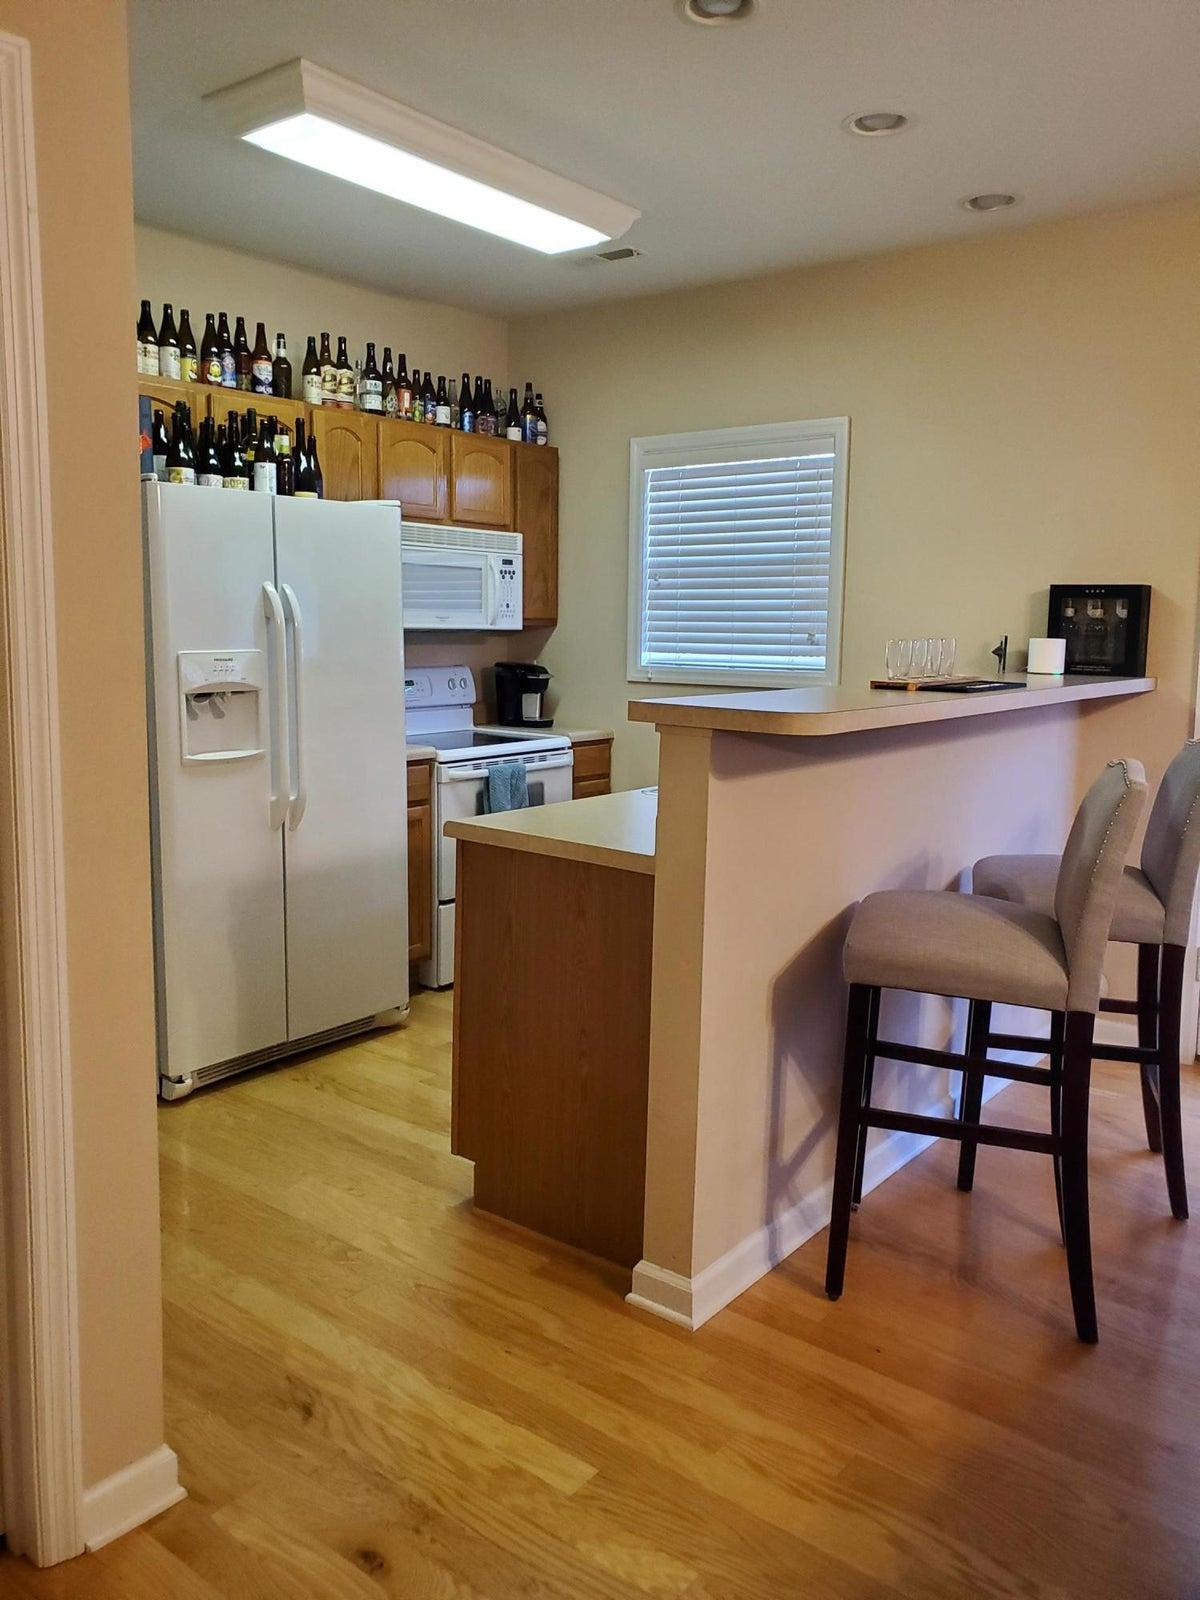 Downstairs Full Kitchen